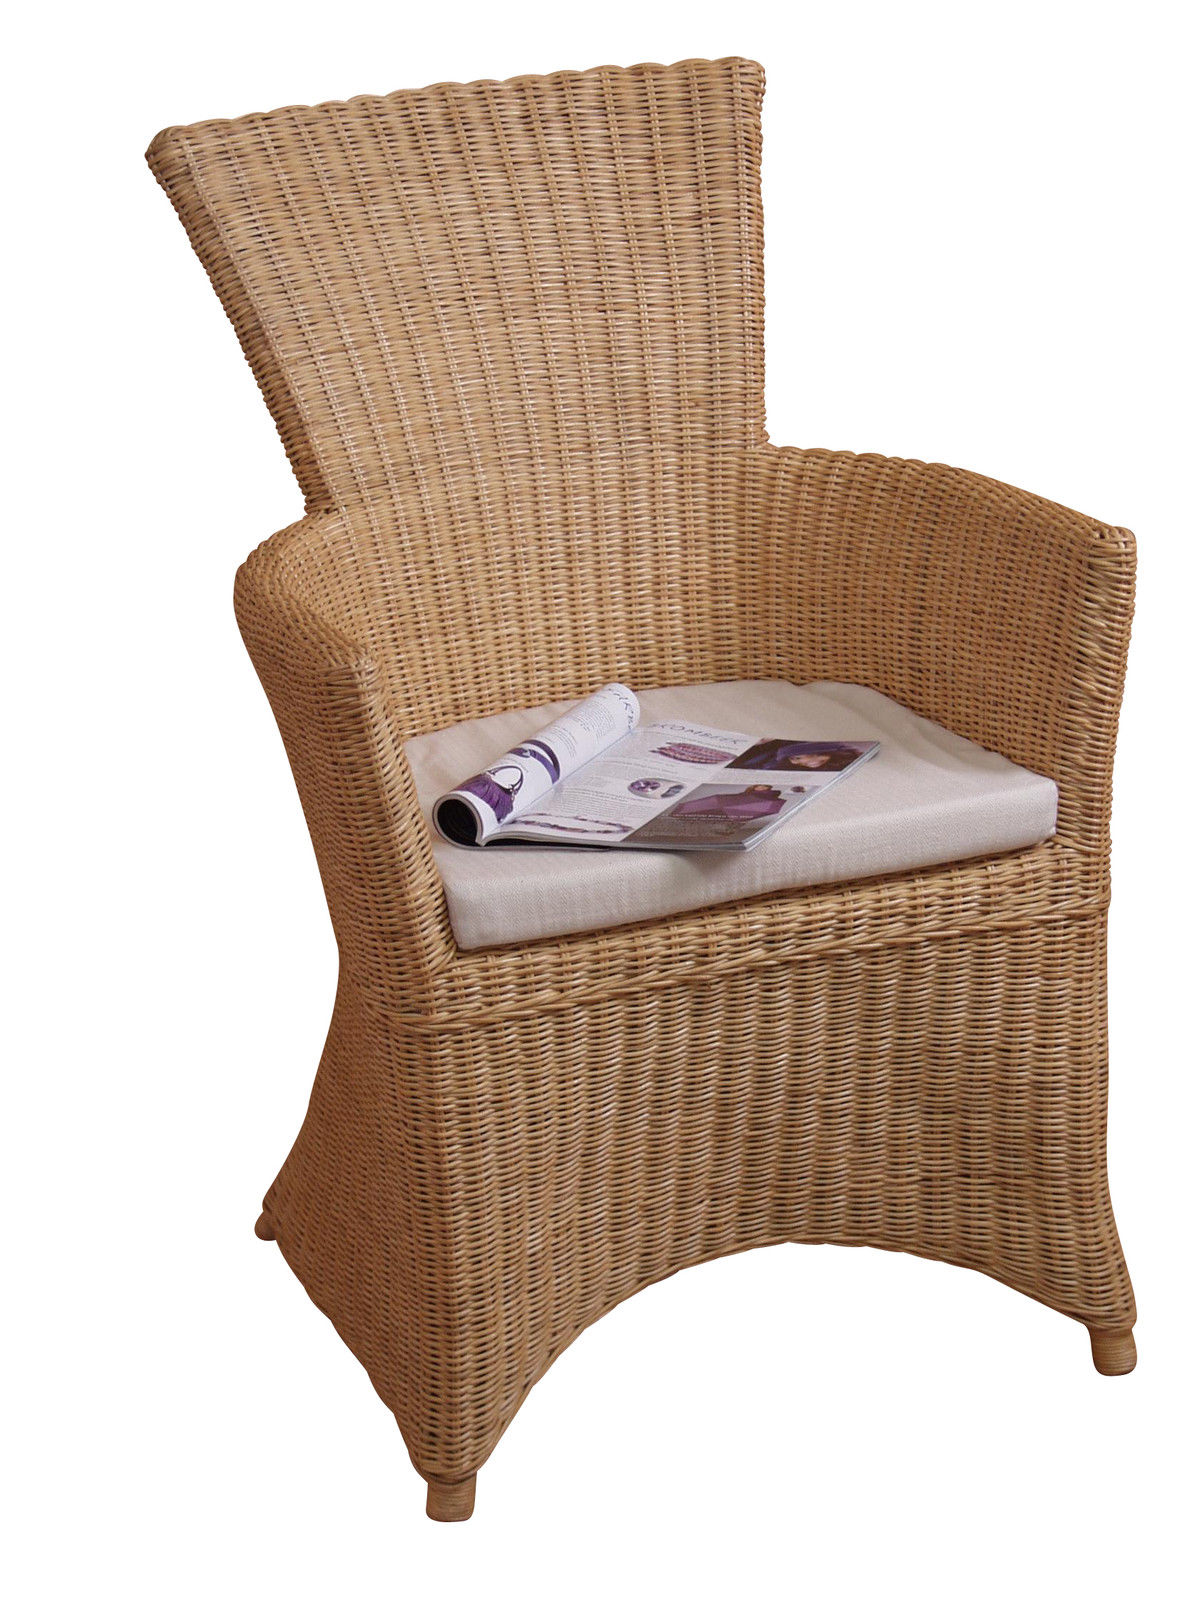 rattansessel beige inkl kissen rattanrohr sessel rattanstuhl rattan stuhl neu kaufen bei go. Black Bedroom Furniture Sets. Home Design Ideas